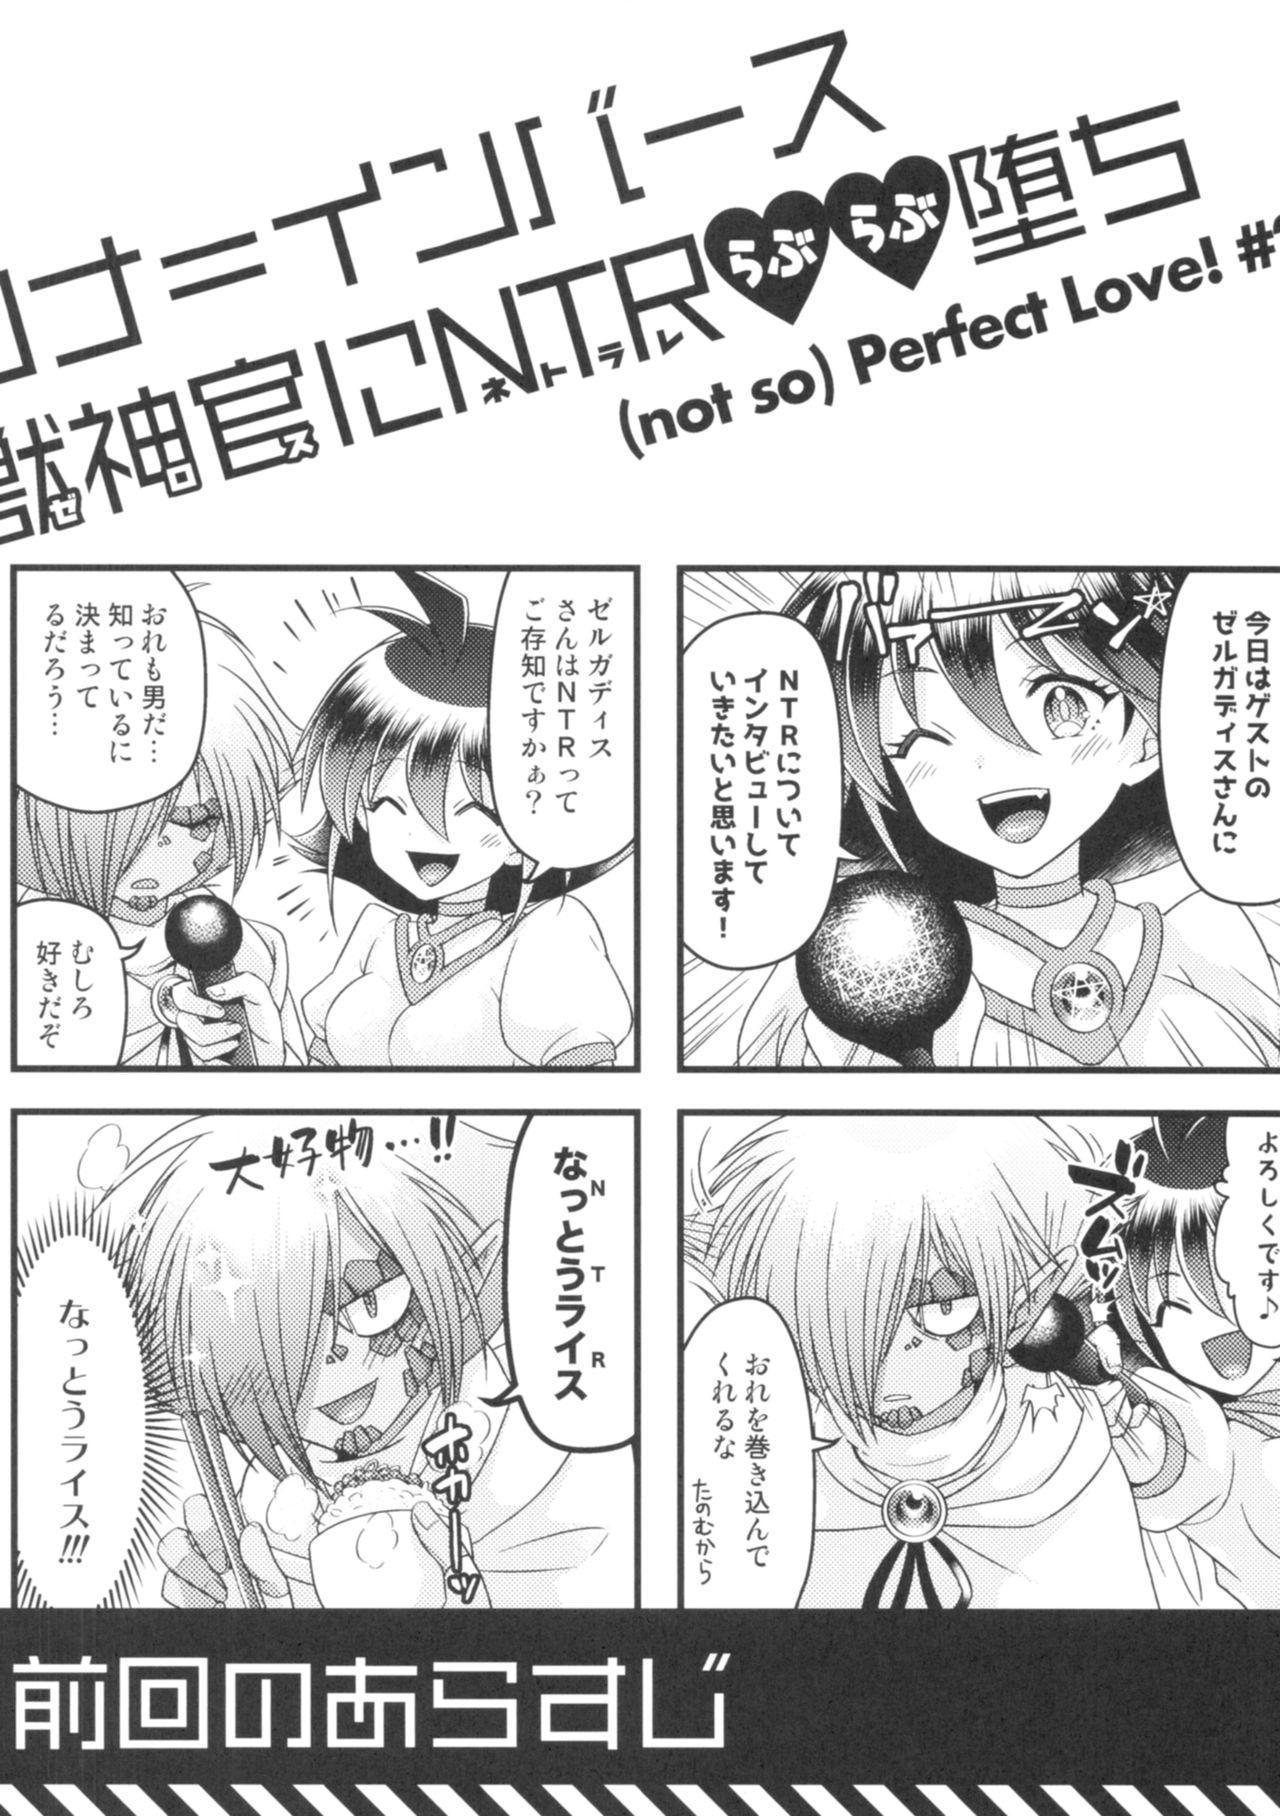 Lina Inverse Juu Shinkan ni NTR Love Love Ochi 1